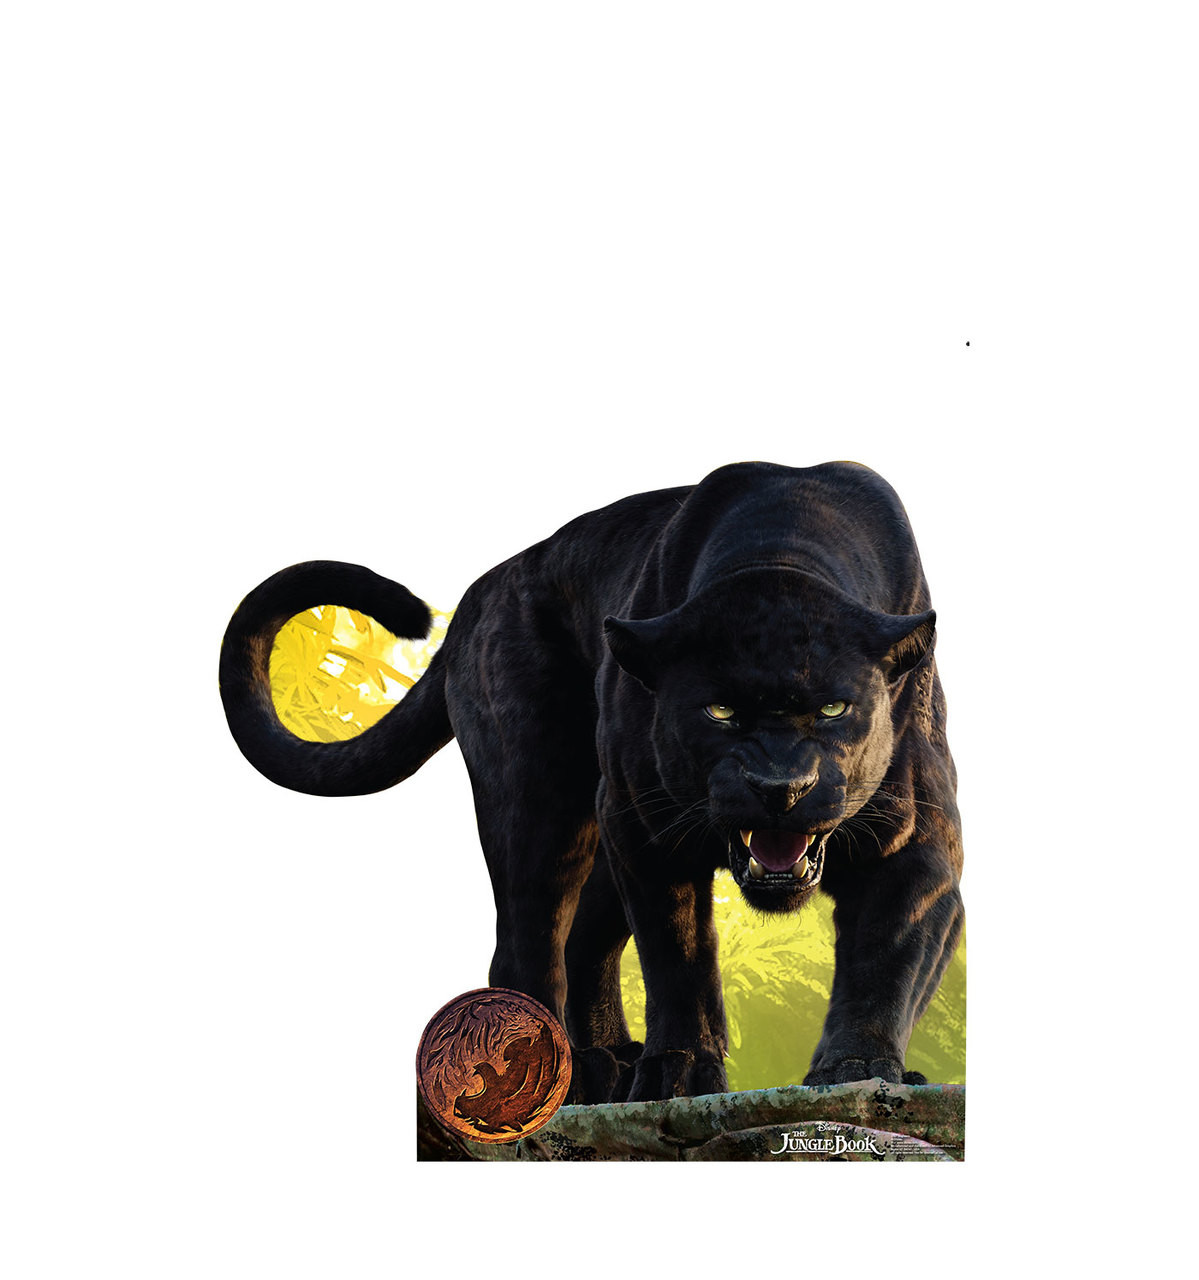 Bagheera - The Jungle Book - Cardboard Cutout Front View